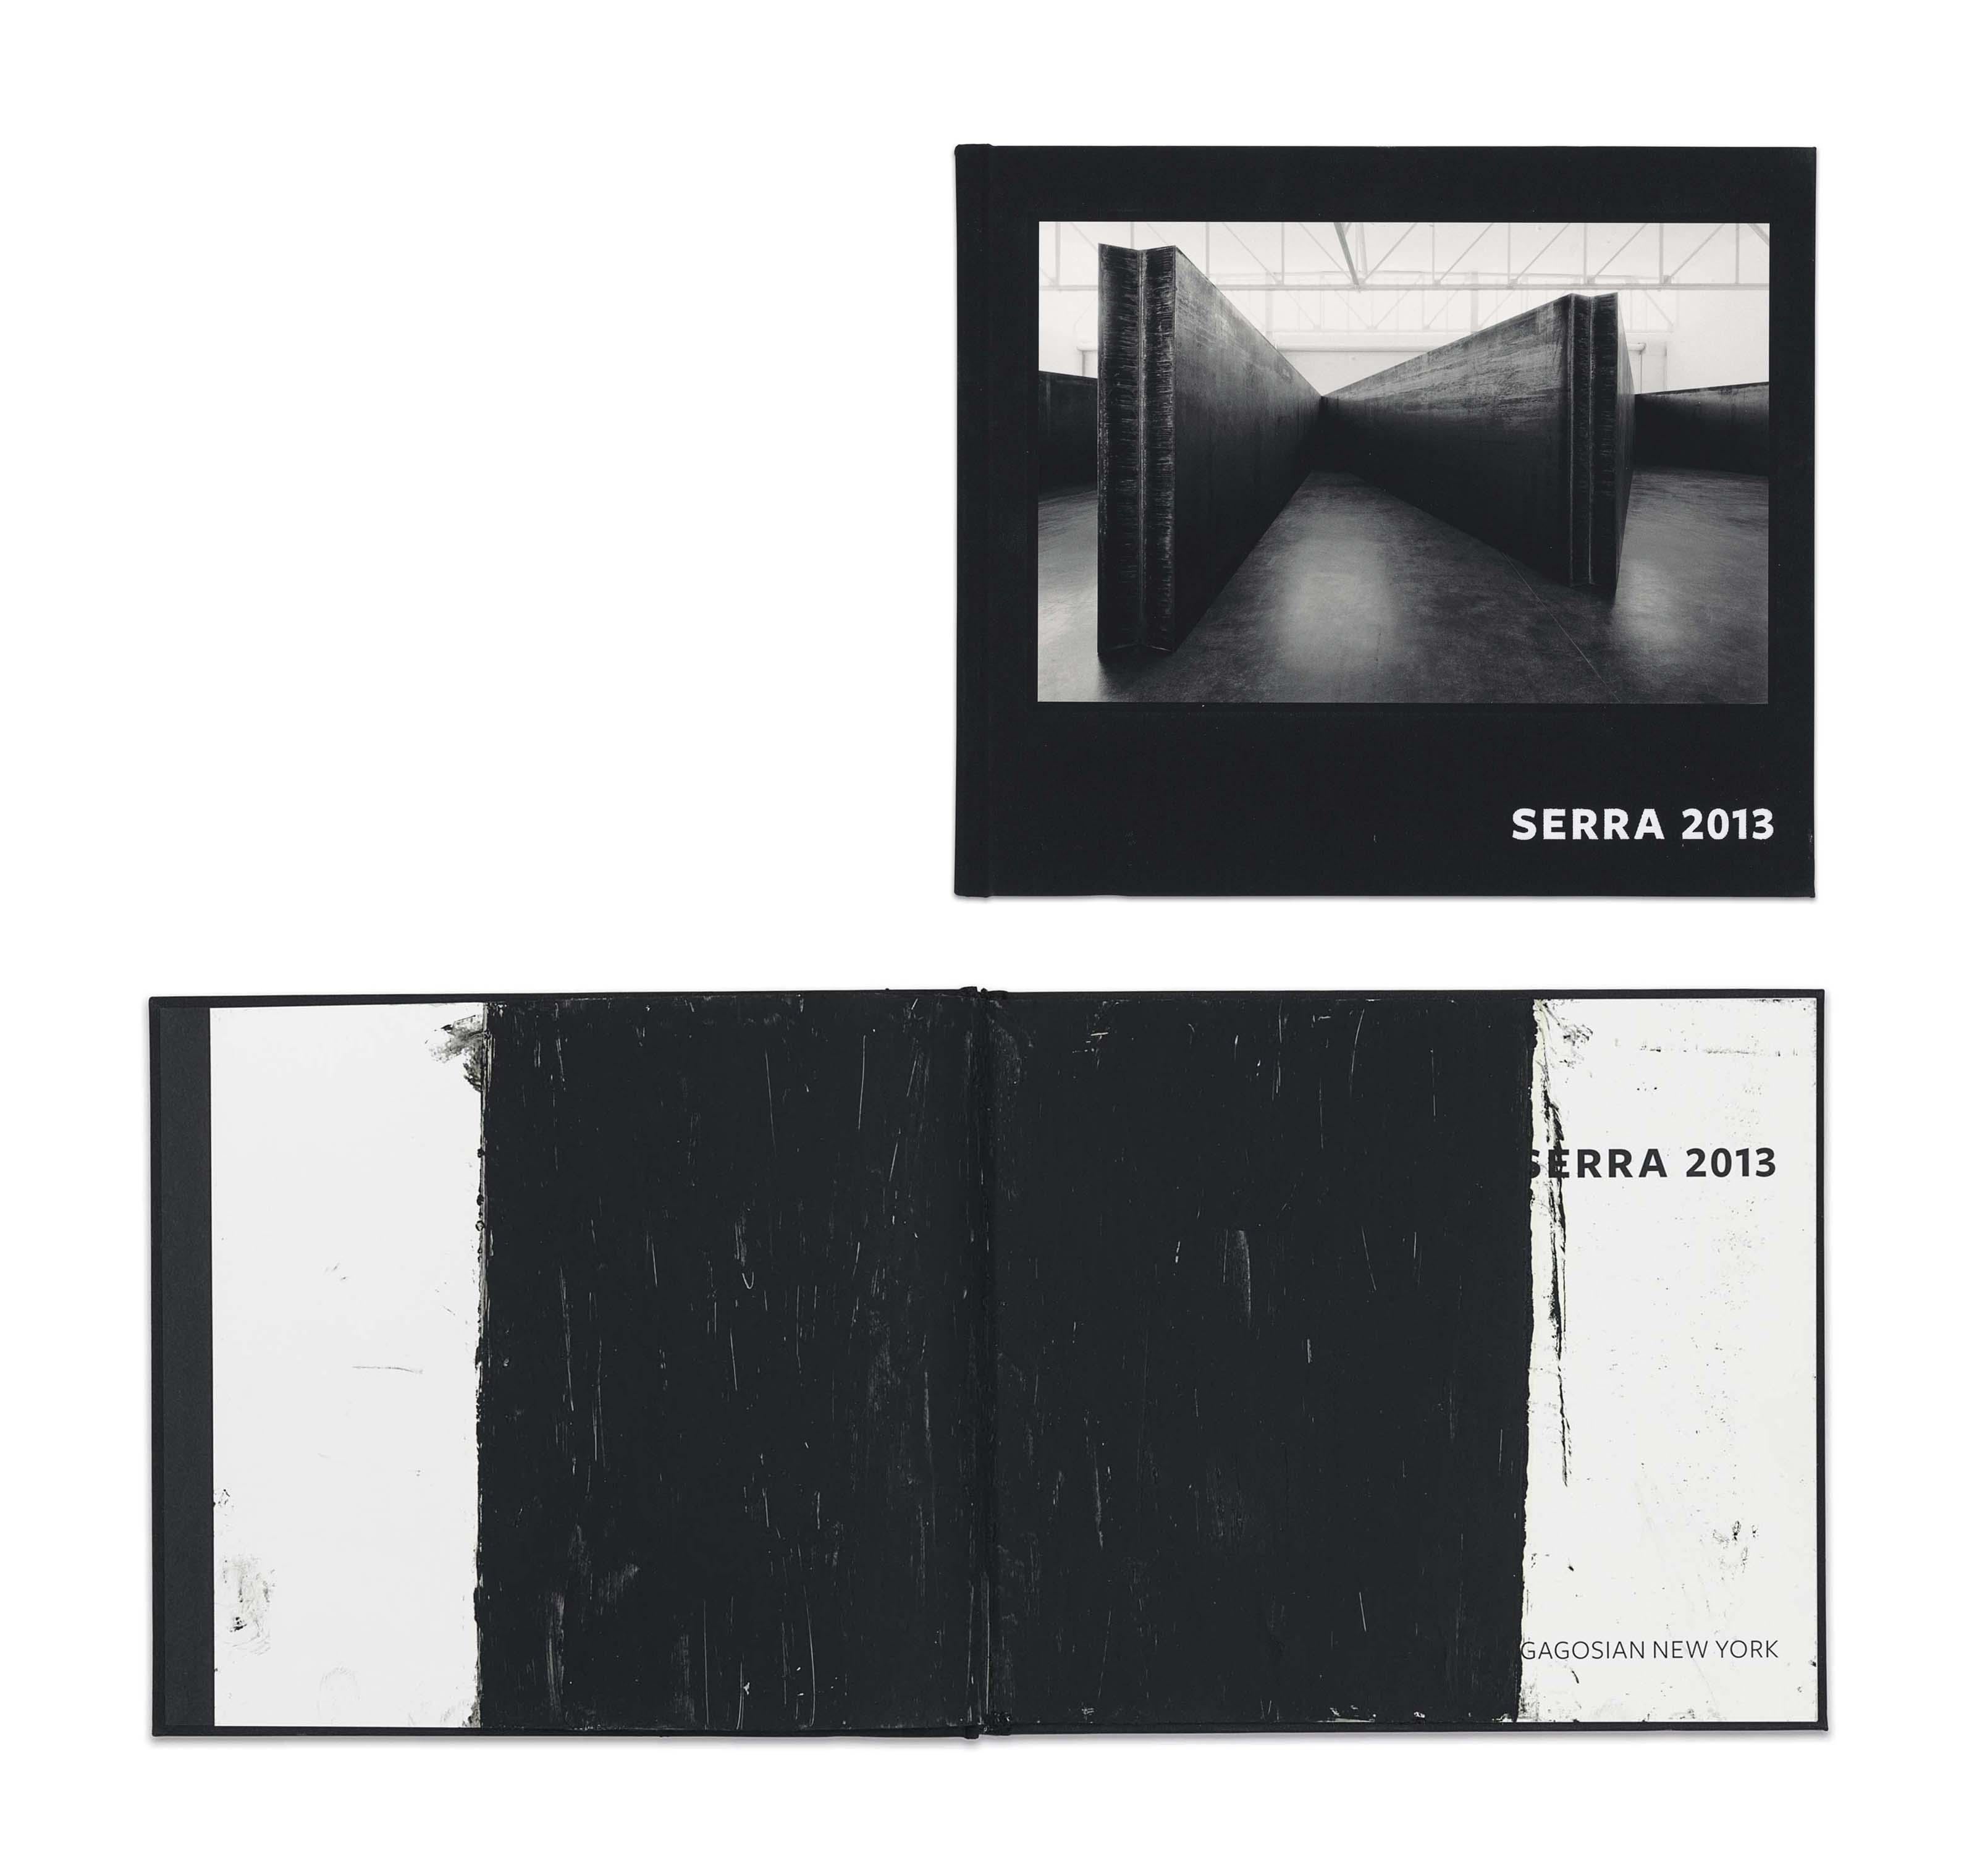 Serra, Richard (b. 1939). Serra 2013. New York: Rizzoli/Gagosian, 2014. 11 1/4 x 9 3/4 x in. Oilstick on printed book.